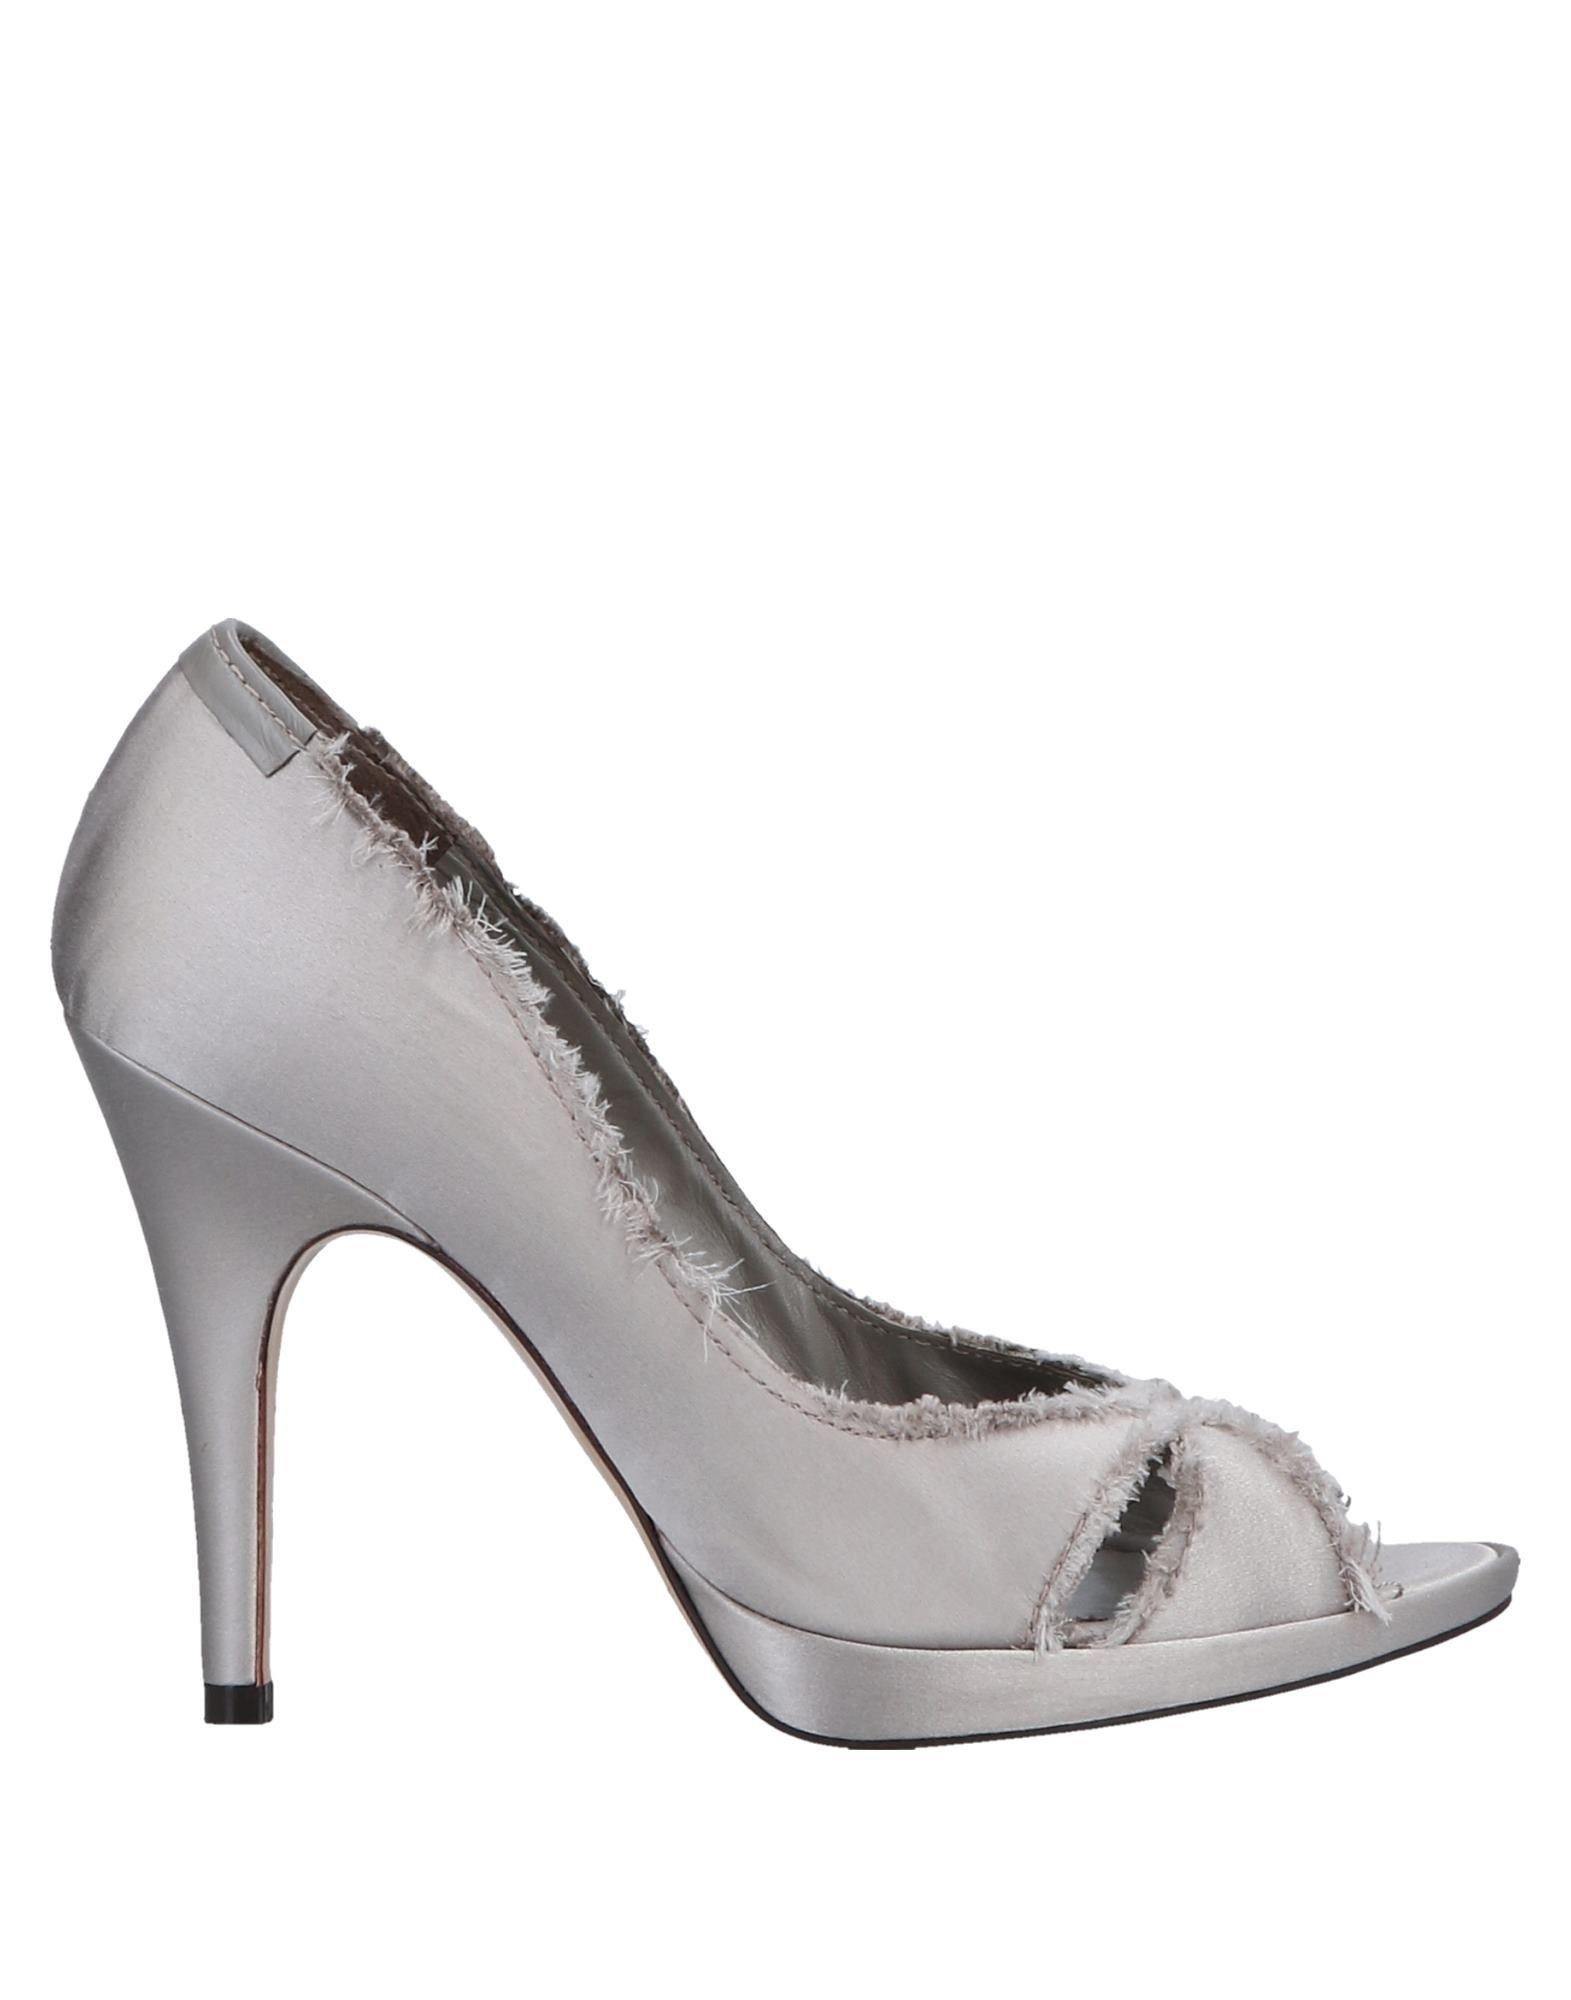 Stilvolle billige Schuhe Damen Pedro García Pumps Damen Schuhe  11064228NK 9ffdf2